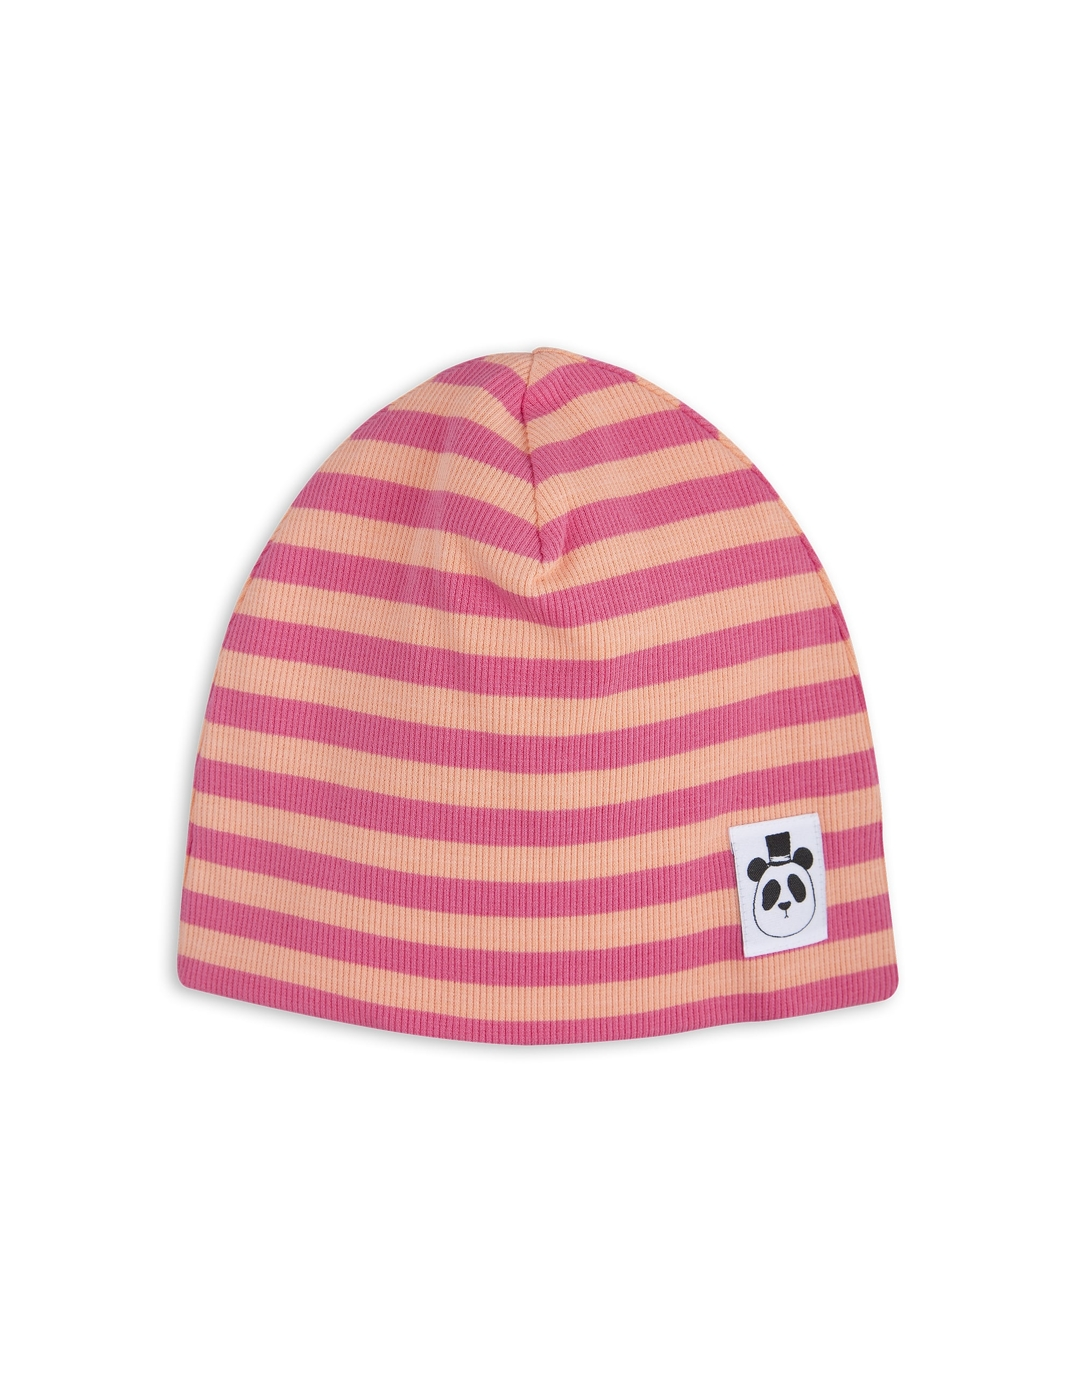 1776515333 1 mini rodini stripe rib beanie pink